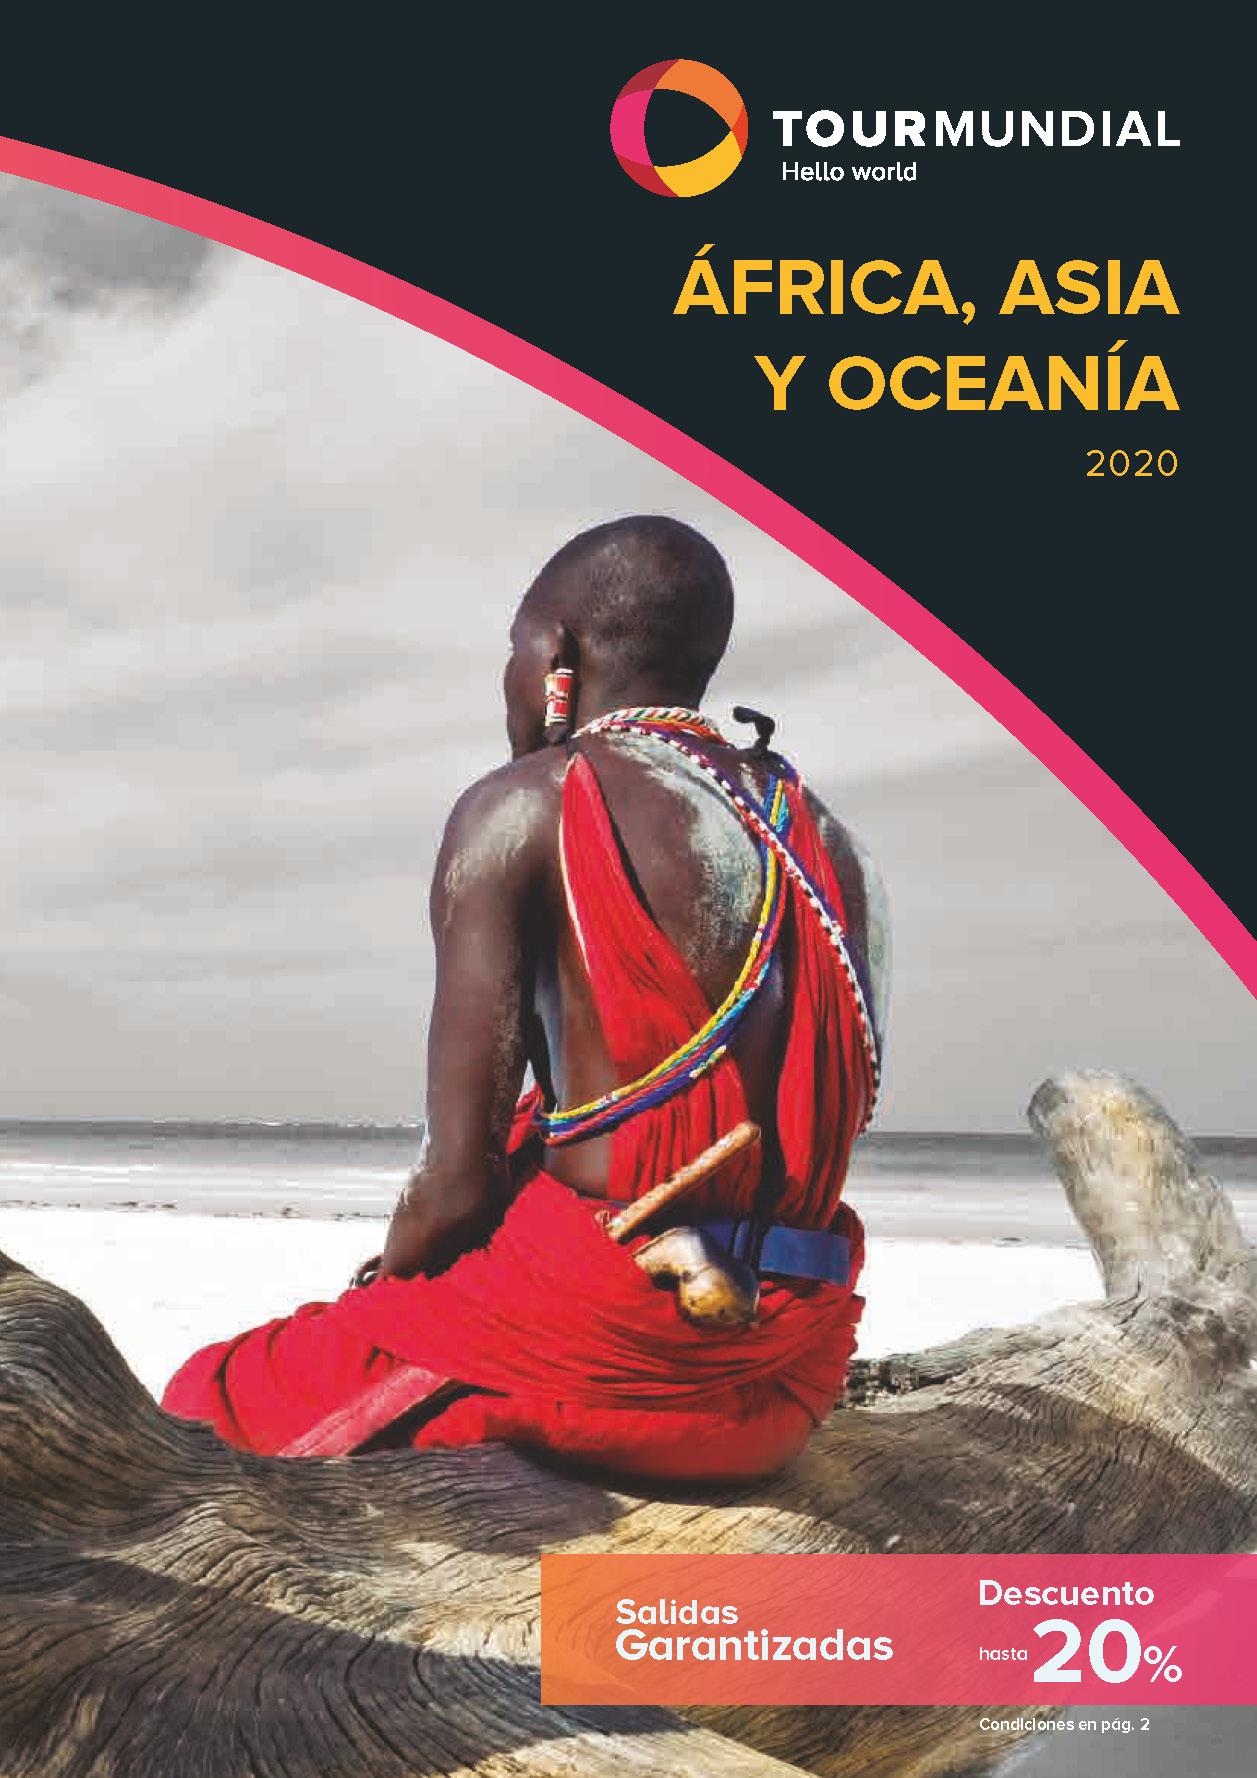 Catalogo Tourmundial Asia Africa y Oceania 2020